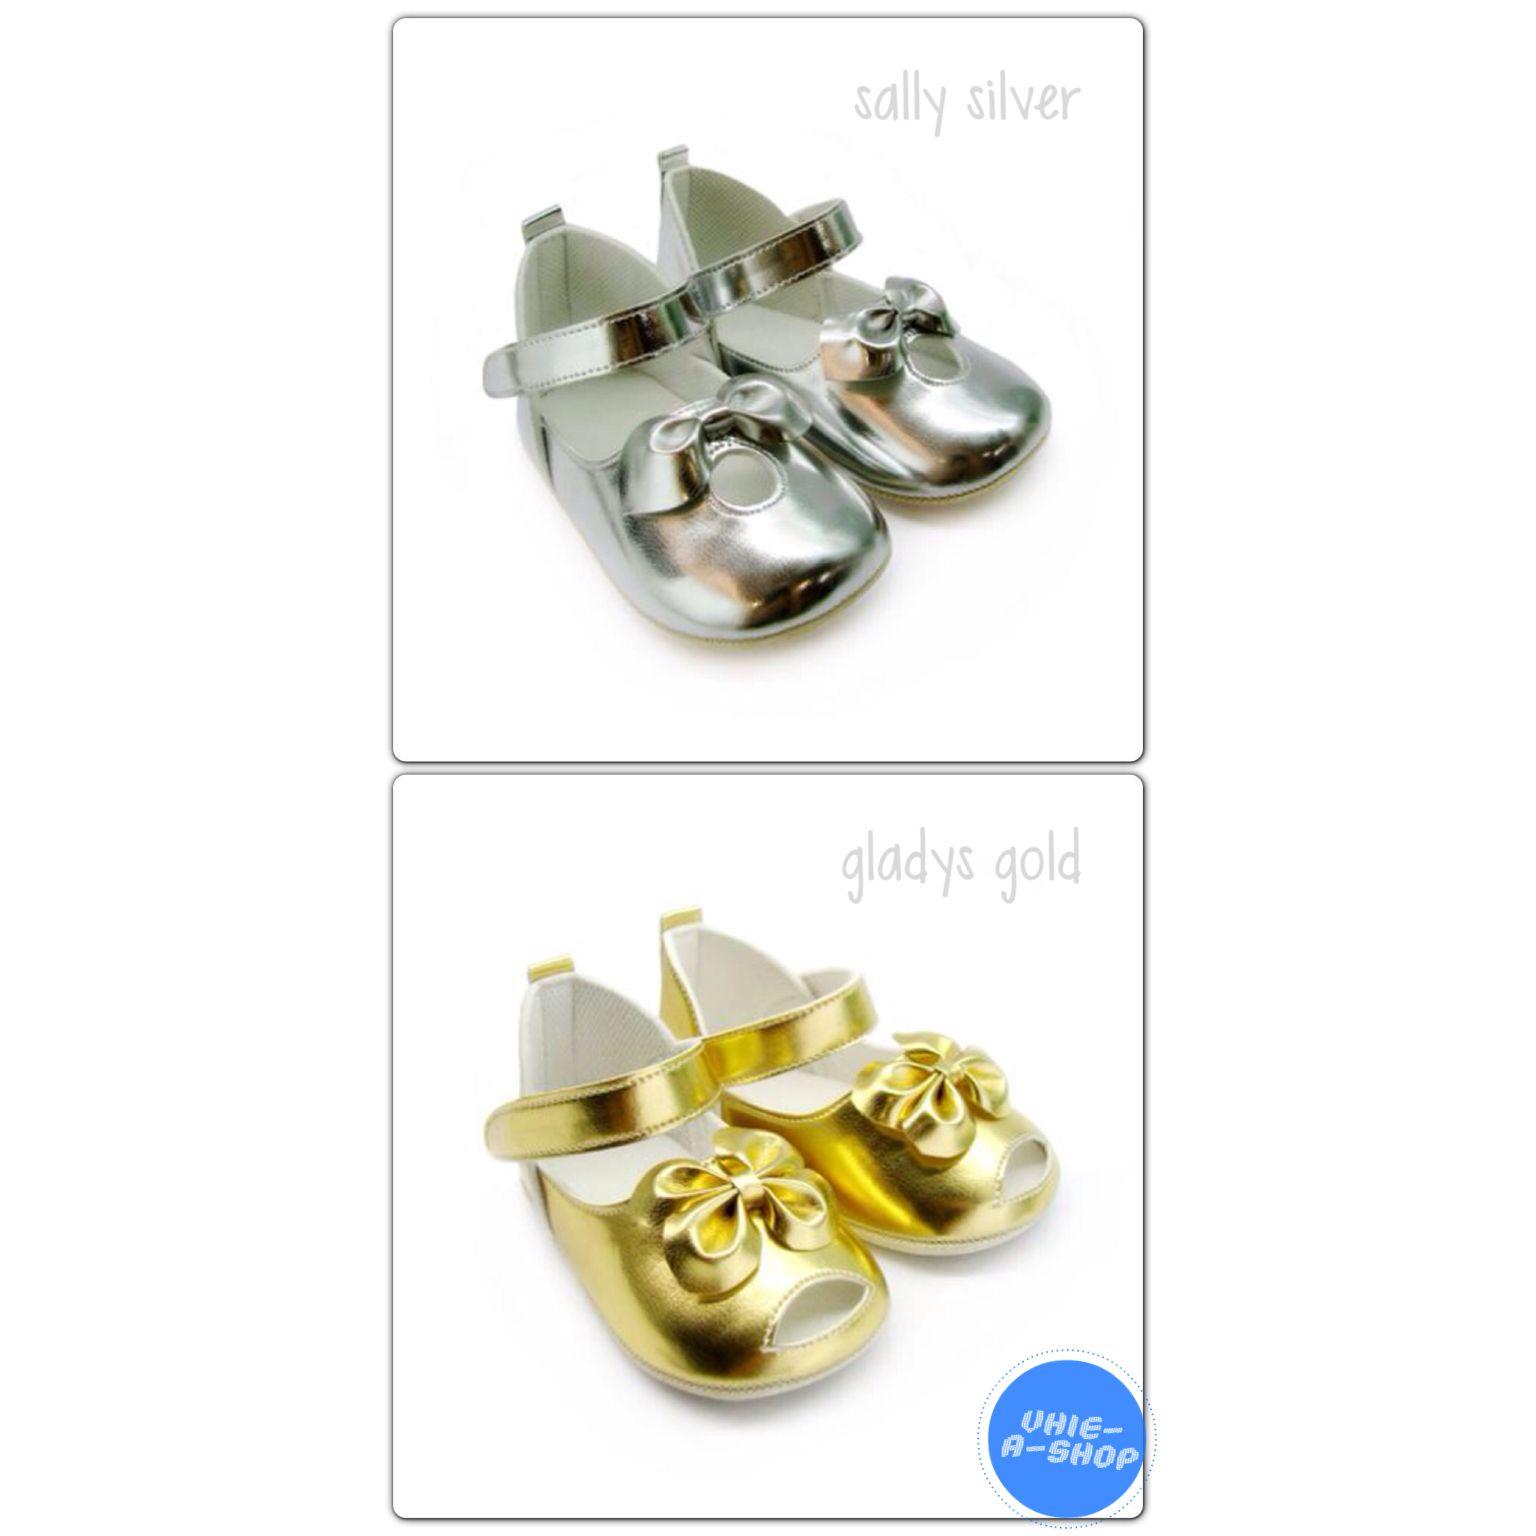 Vhie A Shop Vhieashop On Pinterest Freddie The Frog Baby Shoes Gwen Stripes